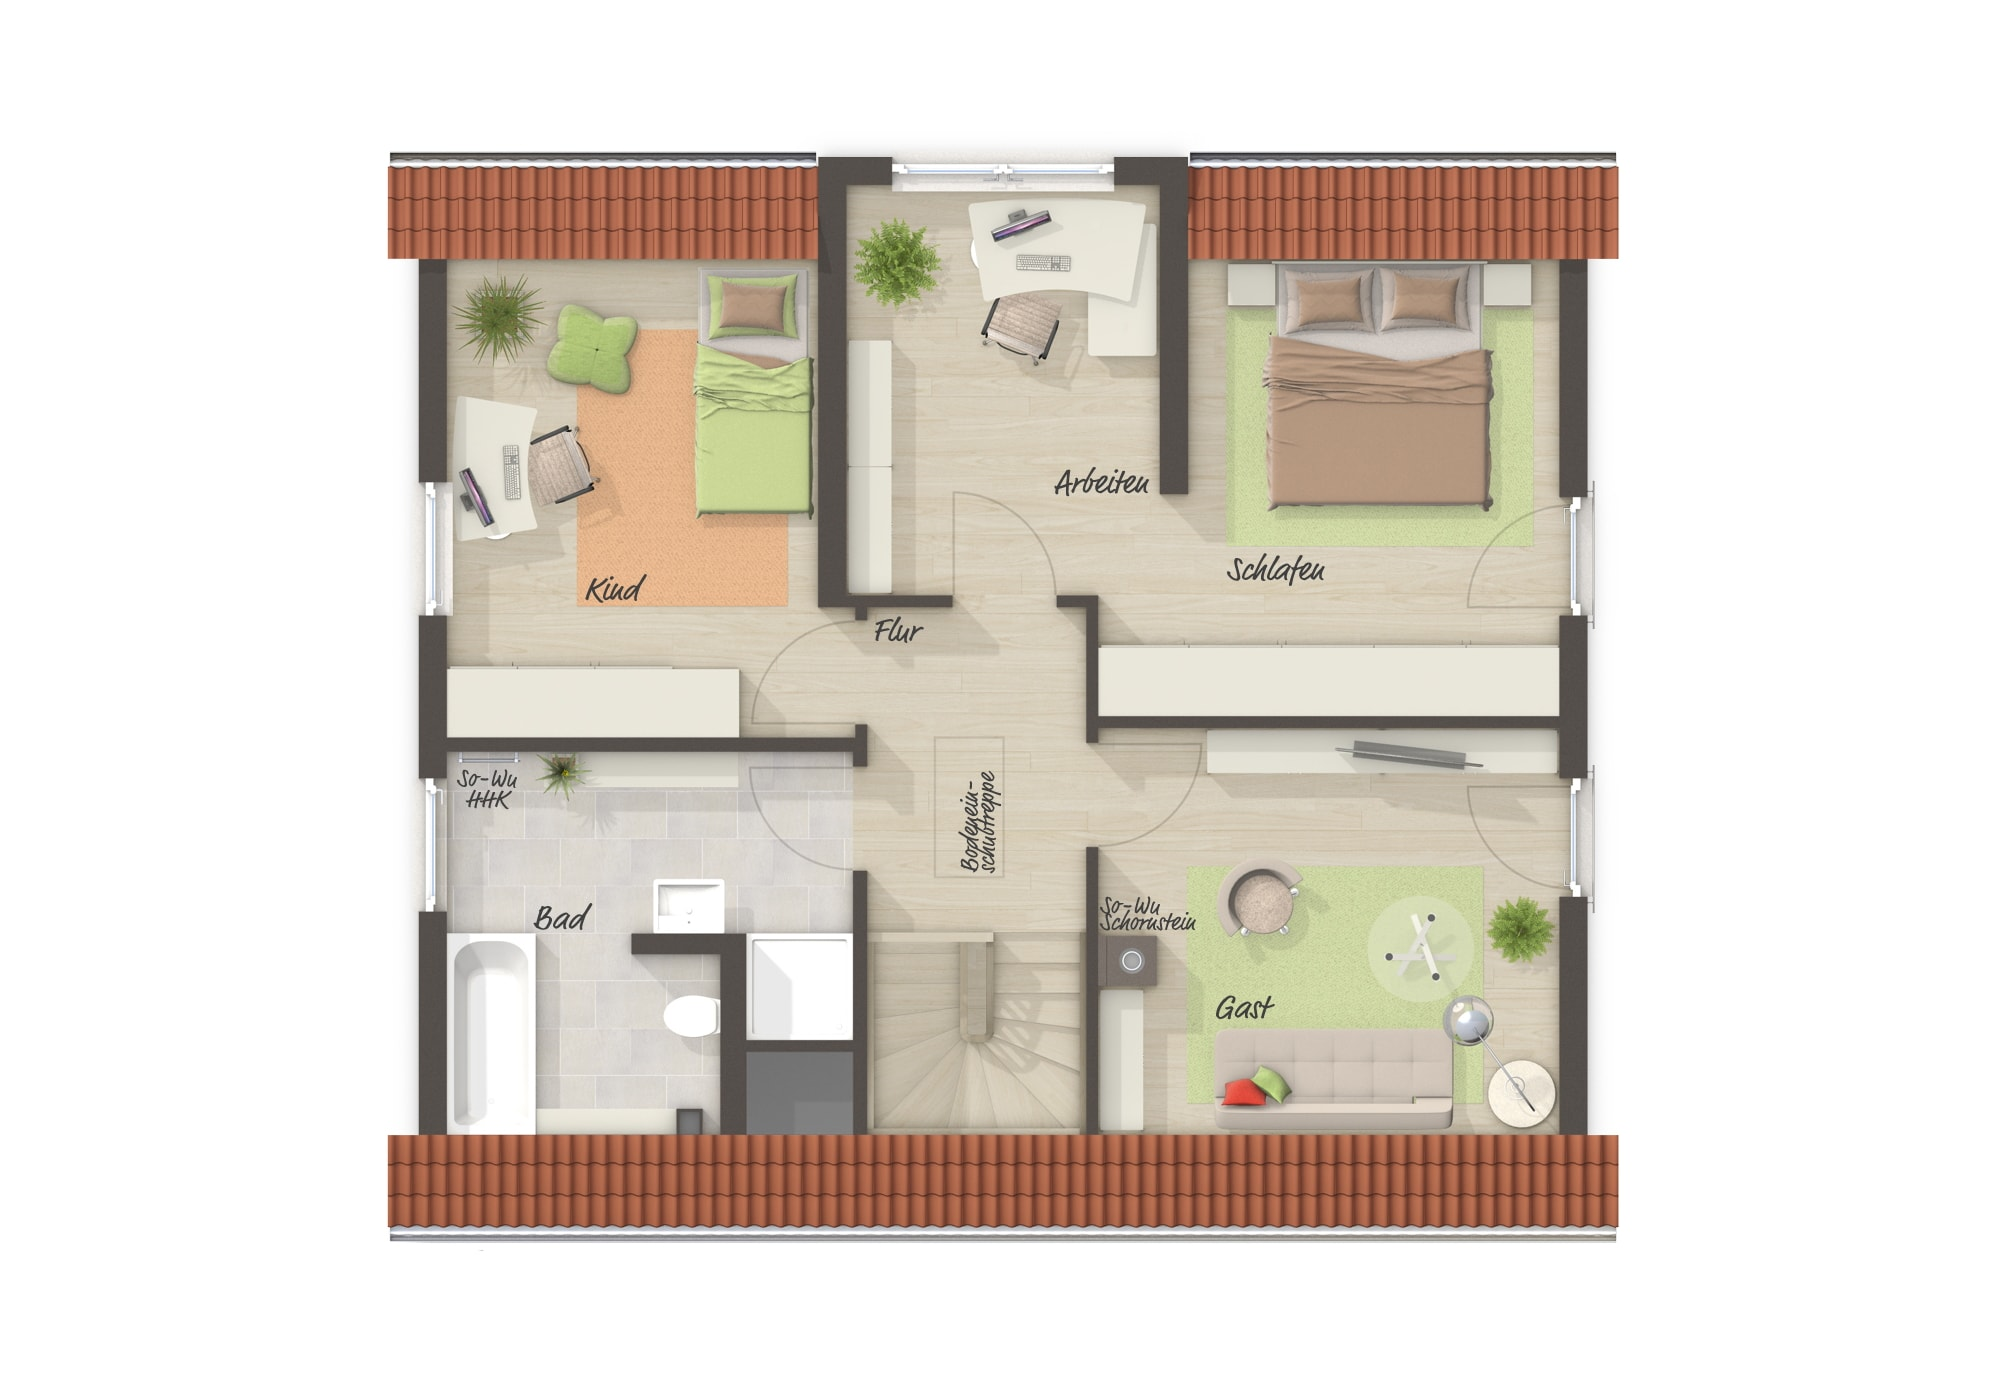 Einfamilienhaus Grundriss Obergeschoss mit Satteldach, 4 Zimmer, 120 qm - Massivhaus bauen Ideen Town Country Haus Lichthaus 121 Trend - HausbauDirekt.de